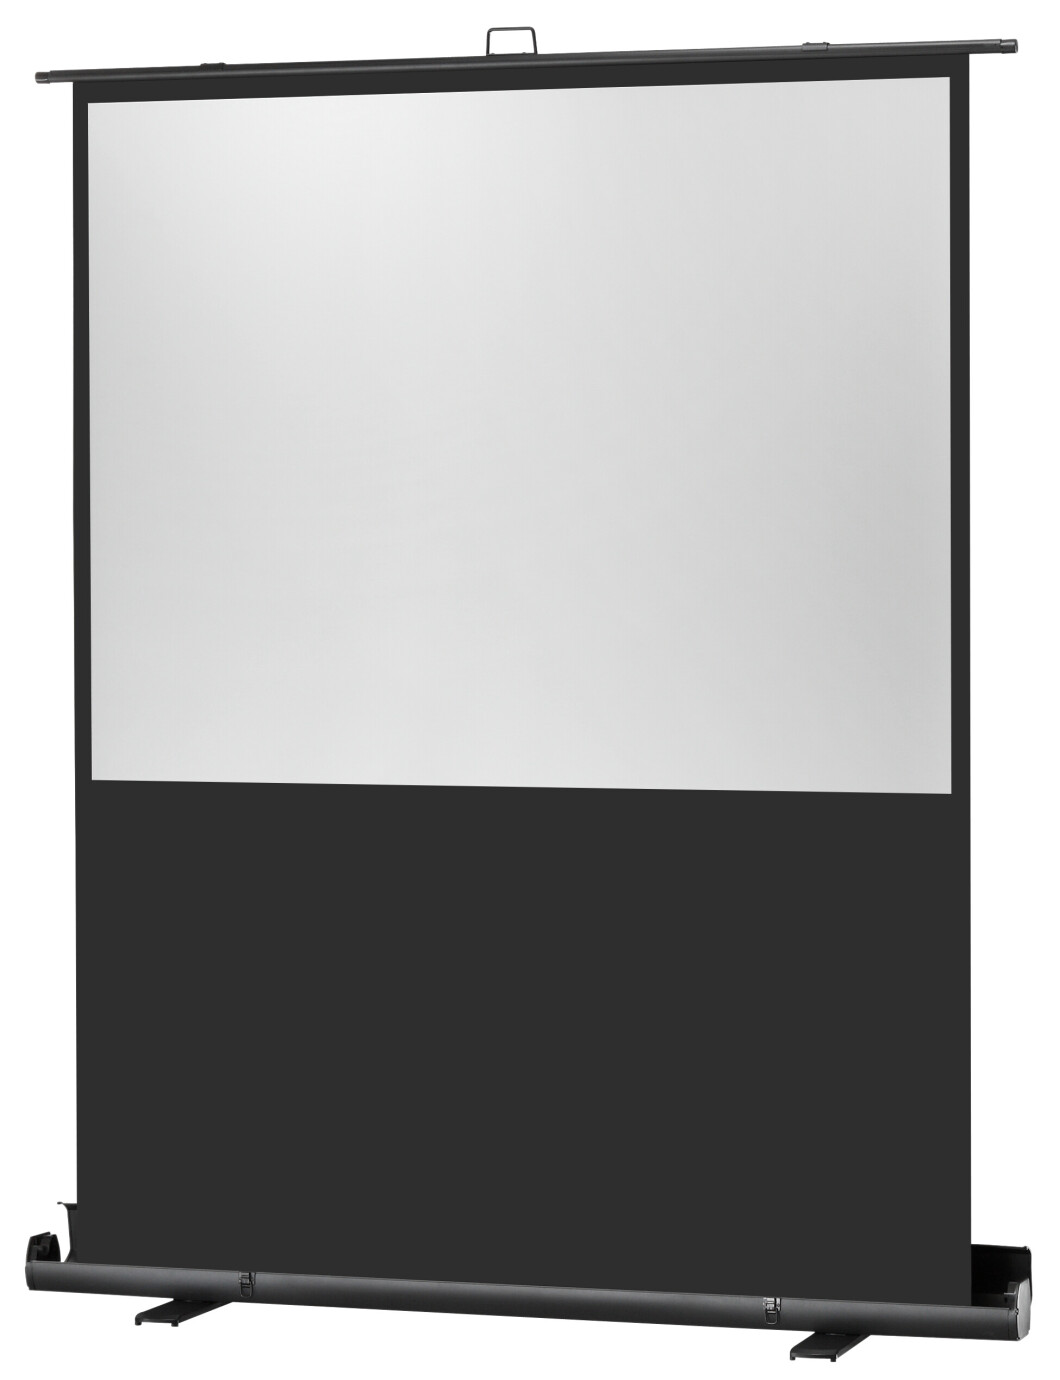 celexon Ultramobil Plus Professional projectiescherm 200 x 150 cm